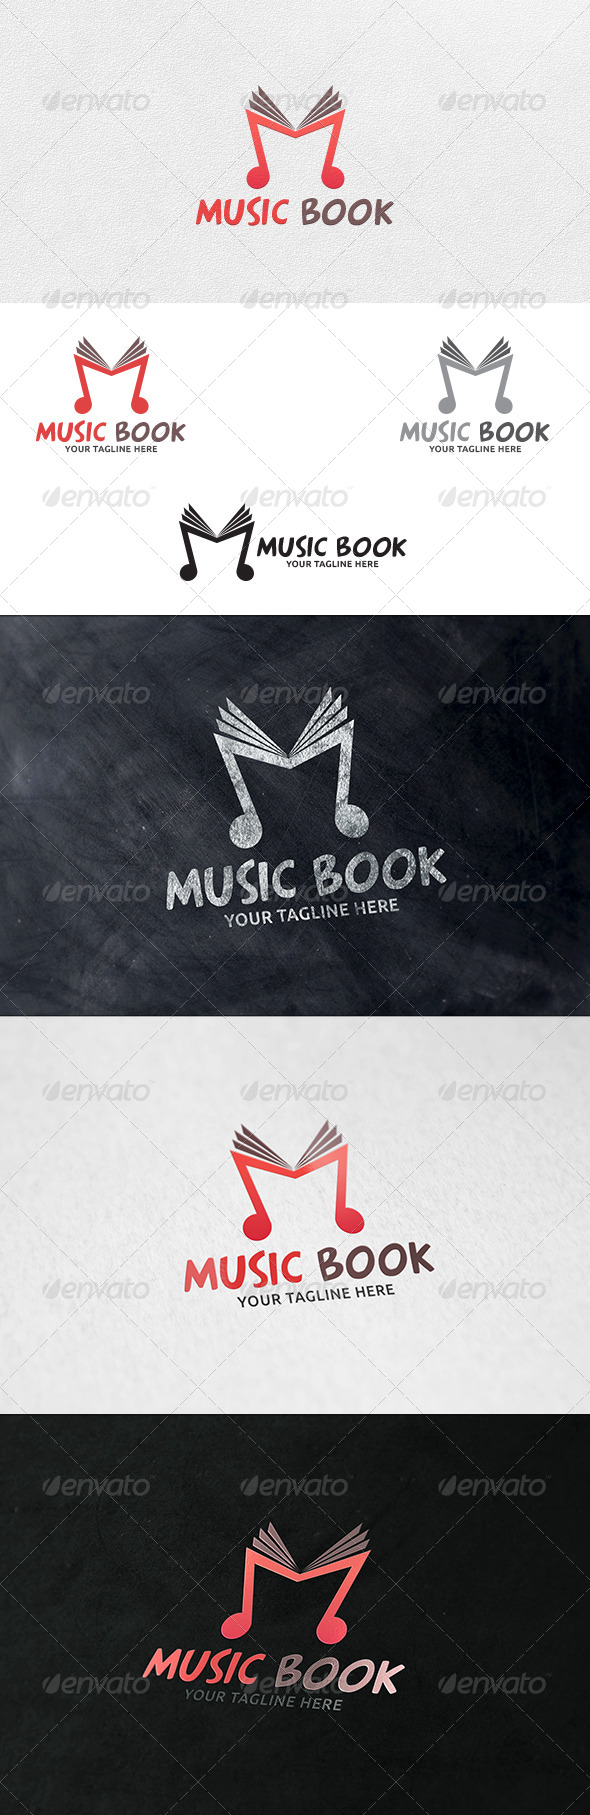 Music Book - Logo Template - Symbols Logo Templates